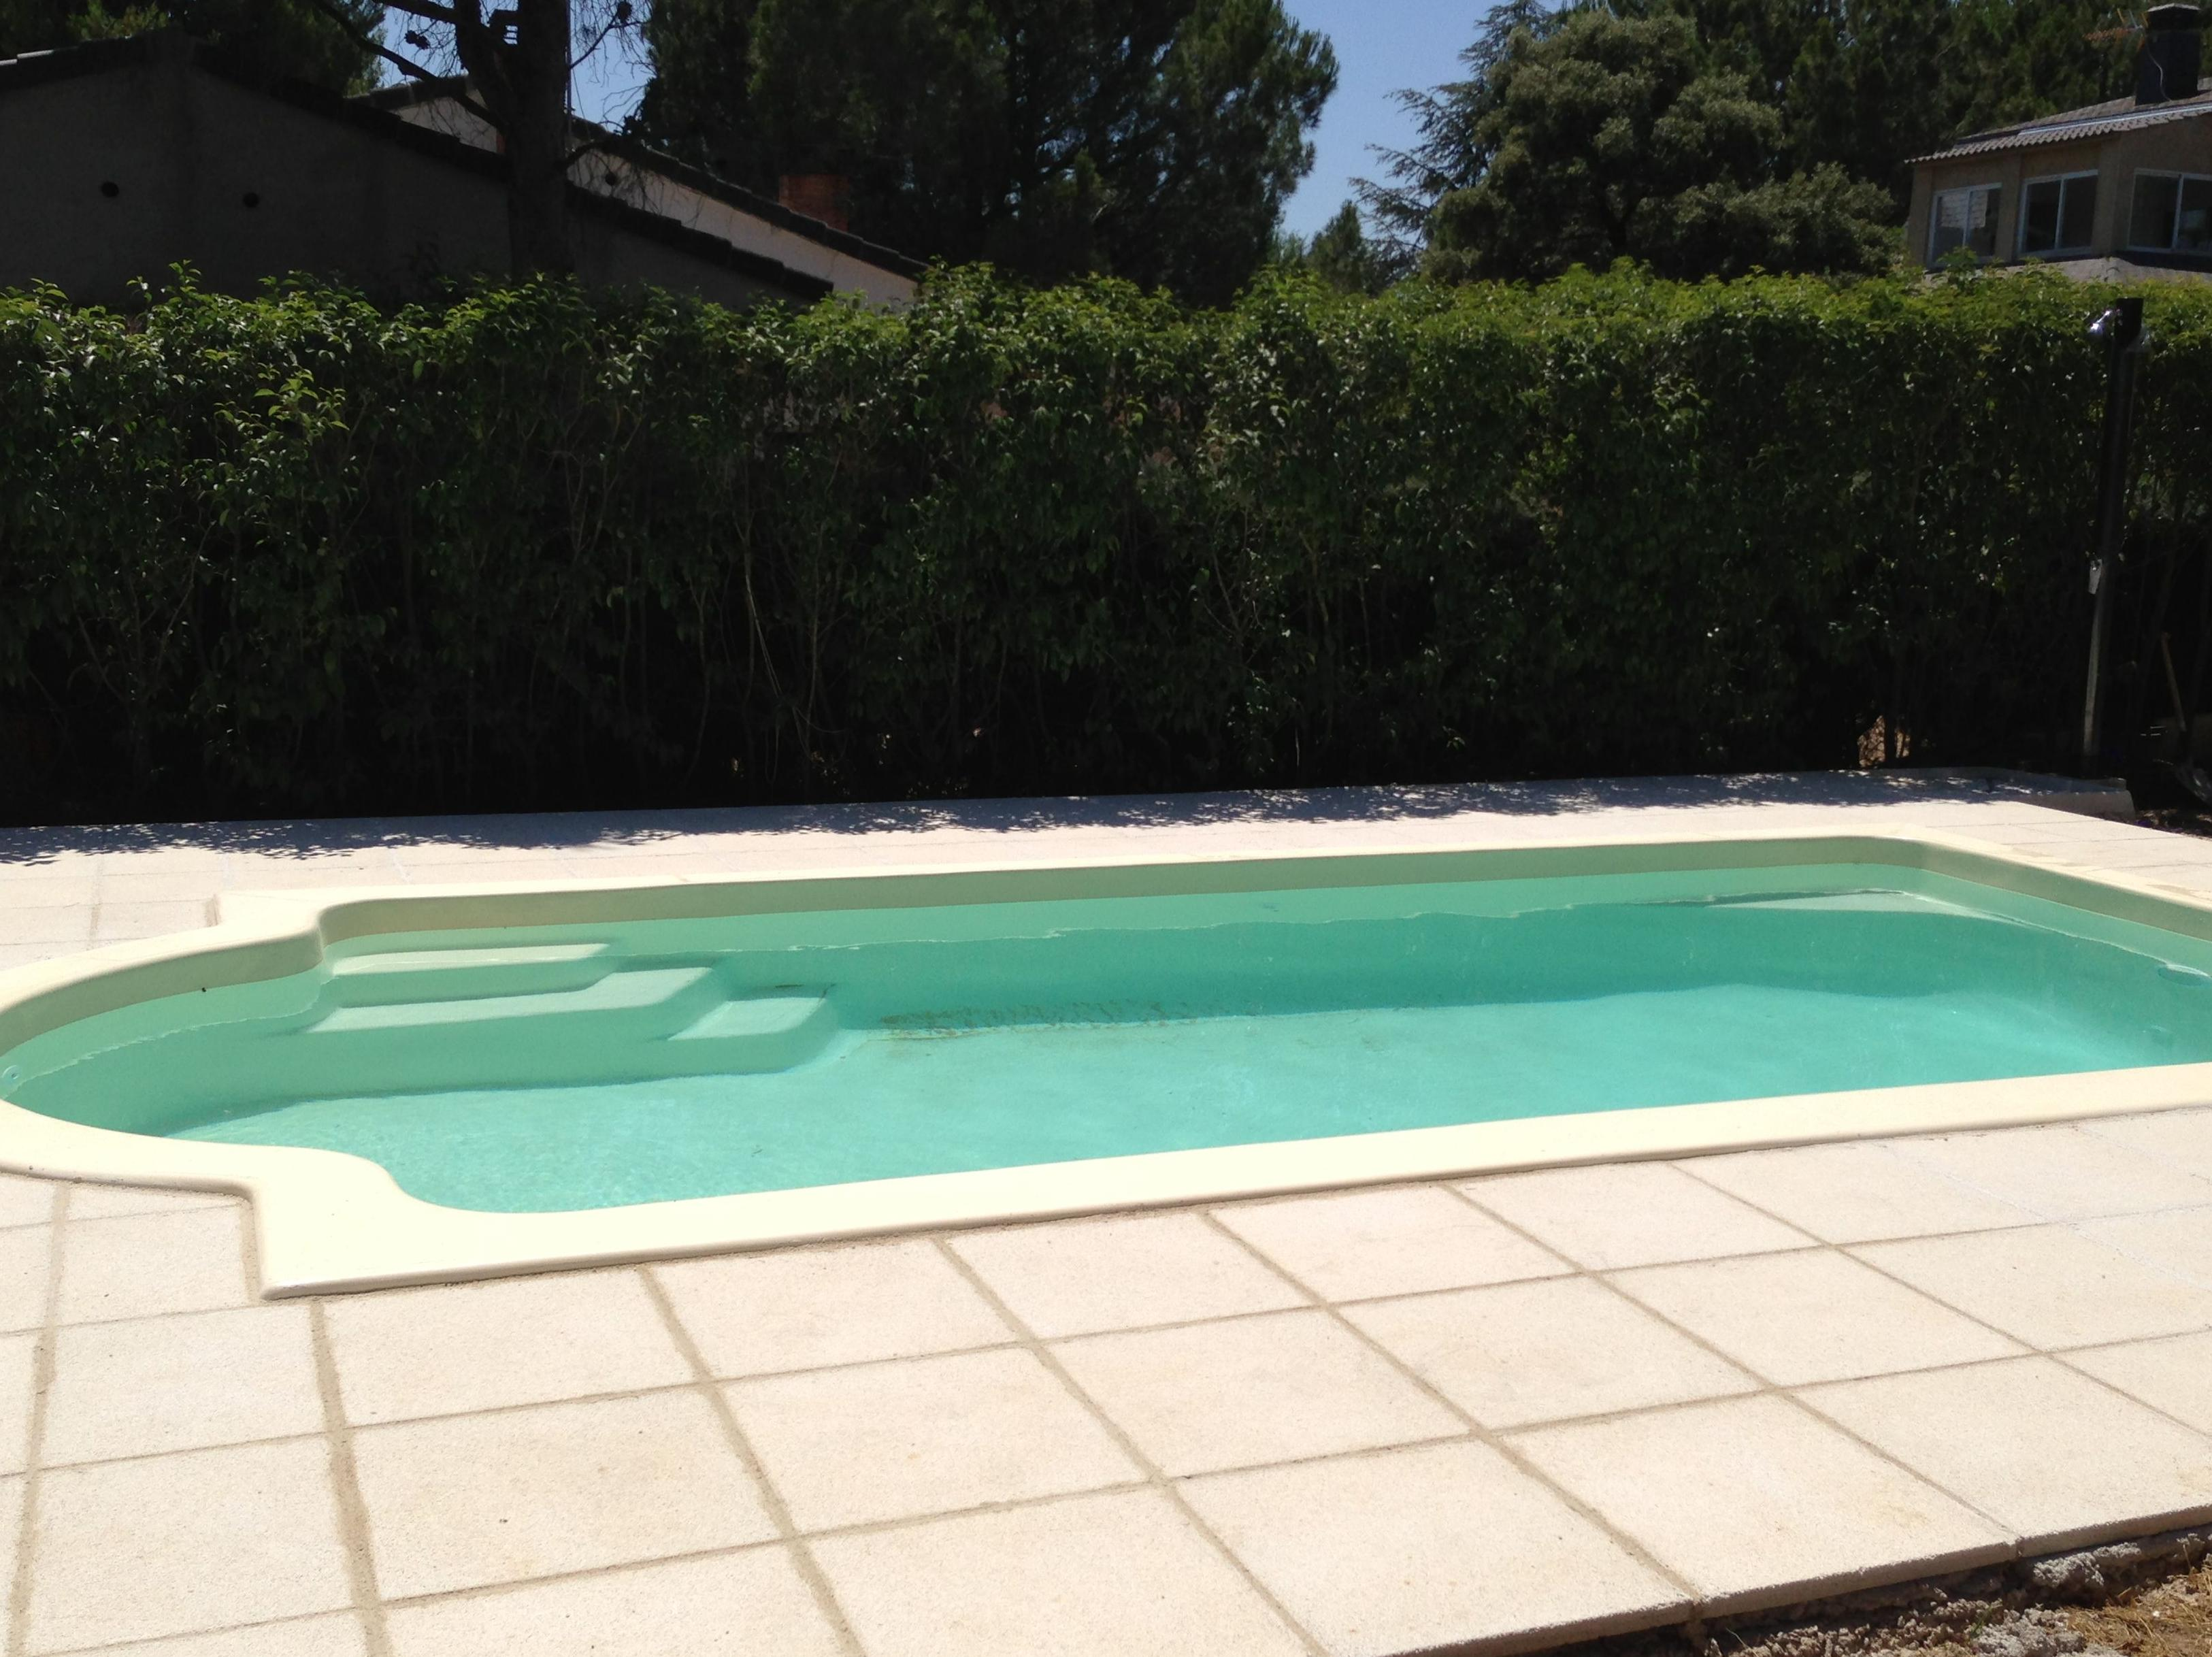 Gresite piscinas colores gallery of gresite piscinas - Gresite piscinas colores ...